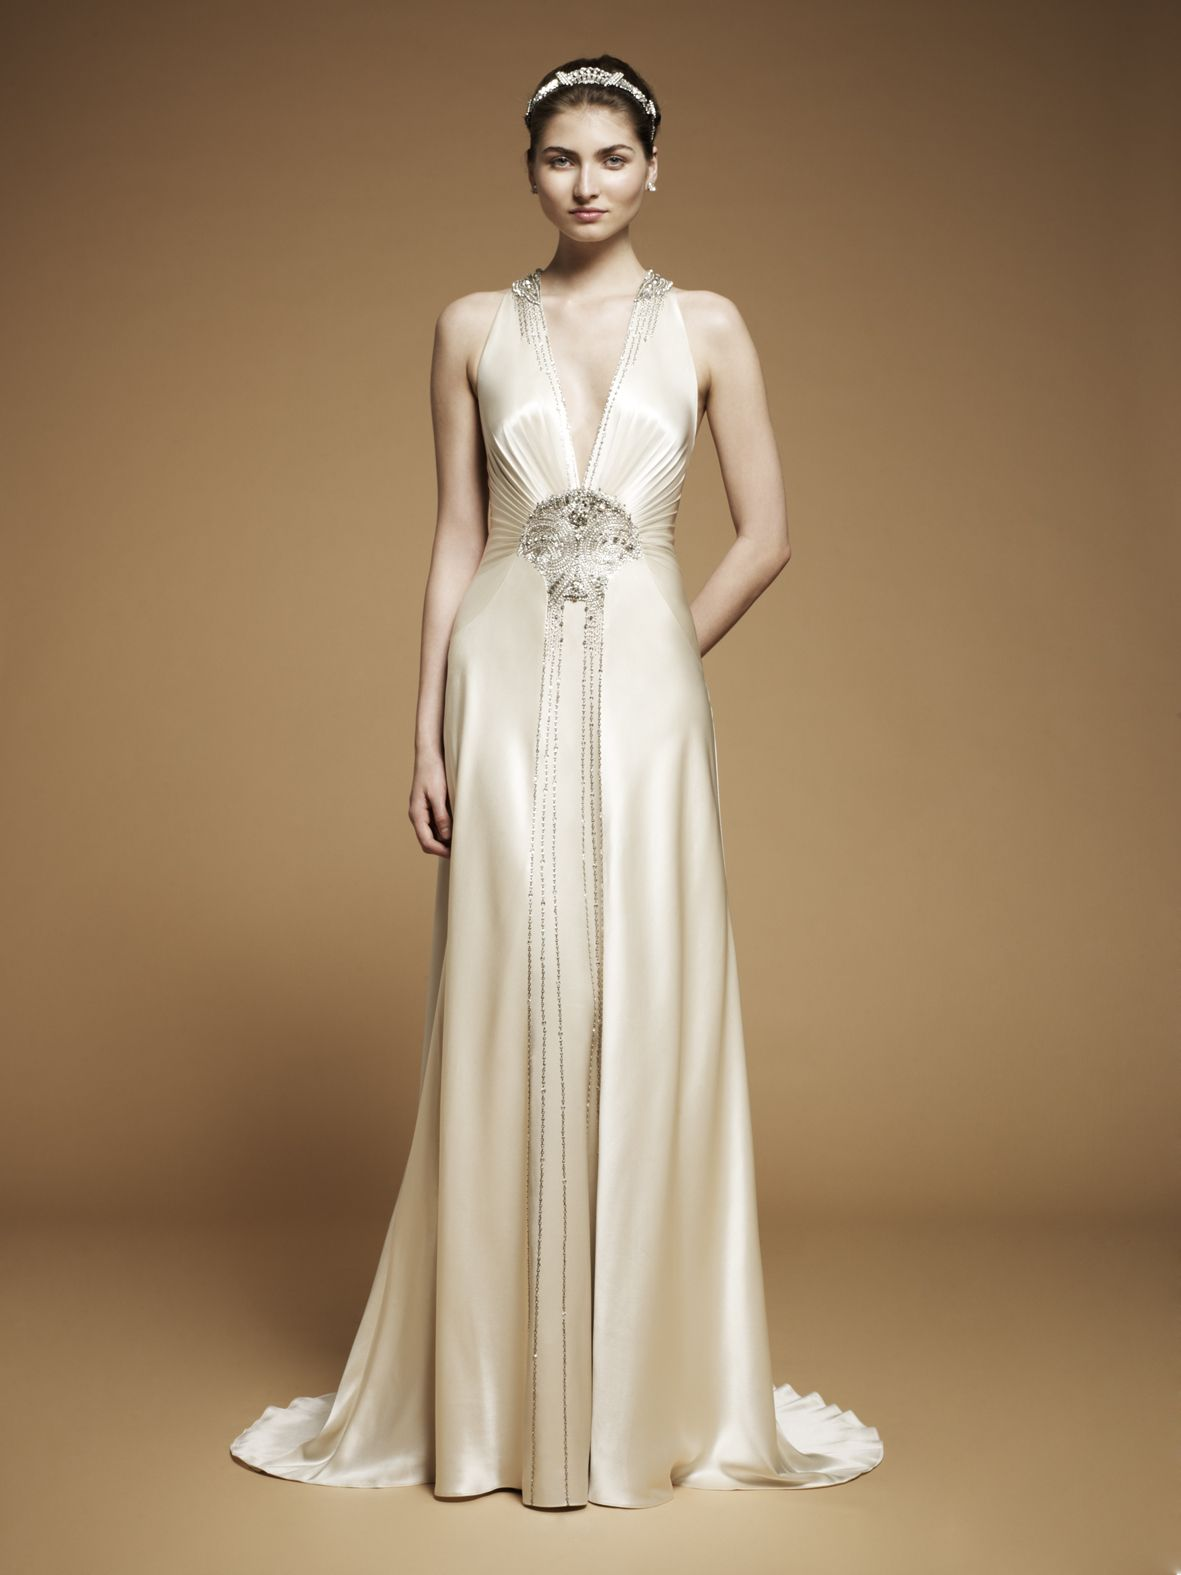 Wedding Dress Jenny Packham Wedding Dresses For Sale 1000 images about jenny packham on pinterest dresses and bridal